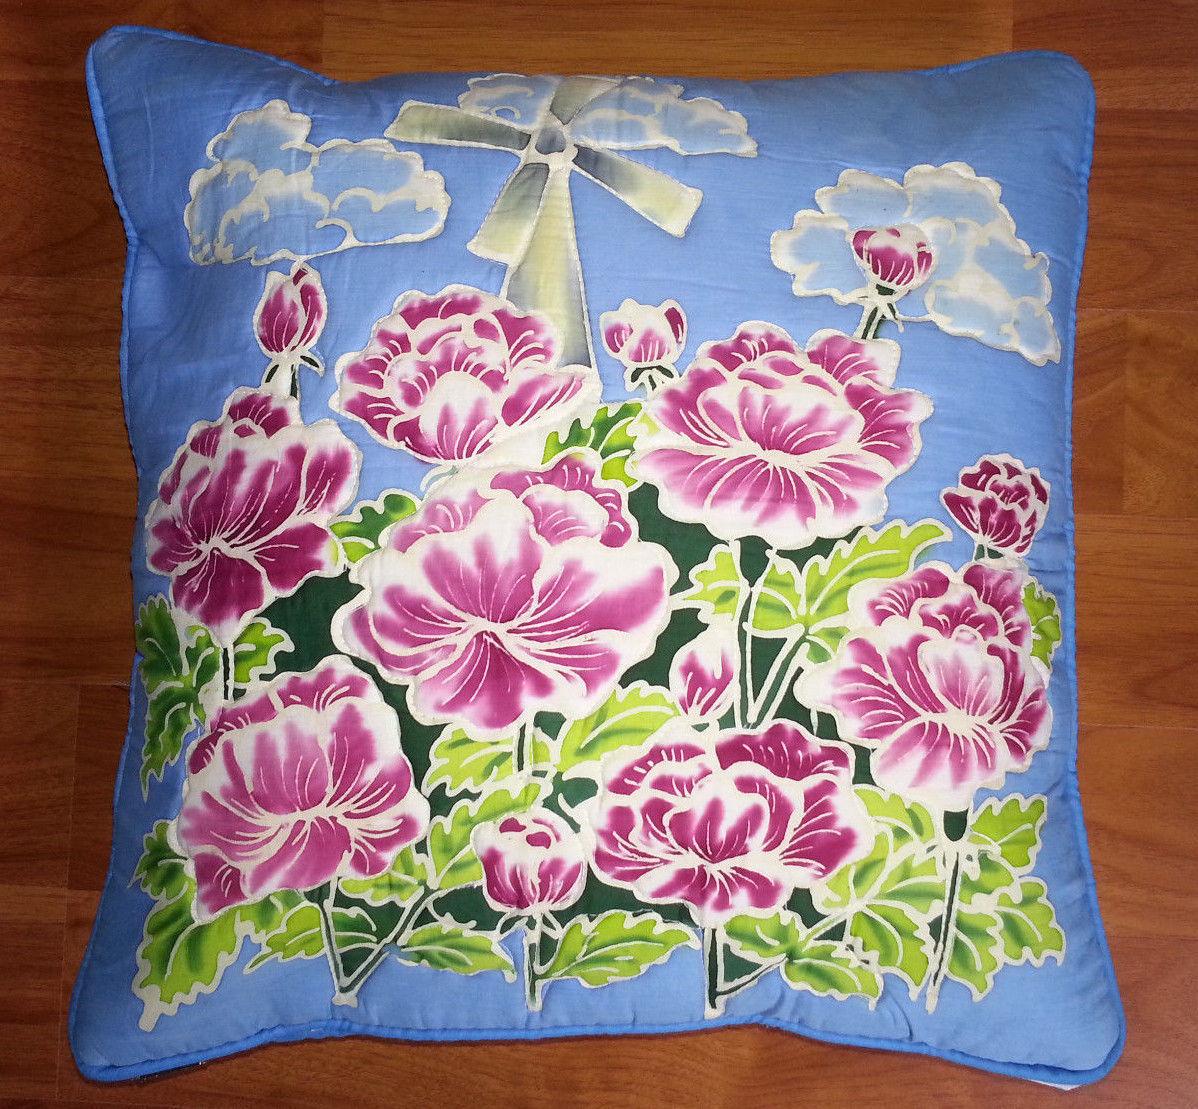 New Handpainted Batik Flowers Windmill 17x17 Inch Cotton Pillow Cover Bali - $14.03